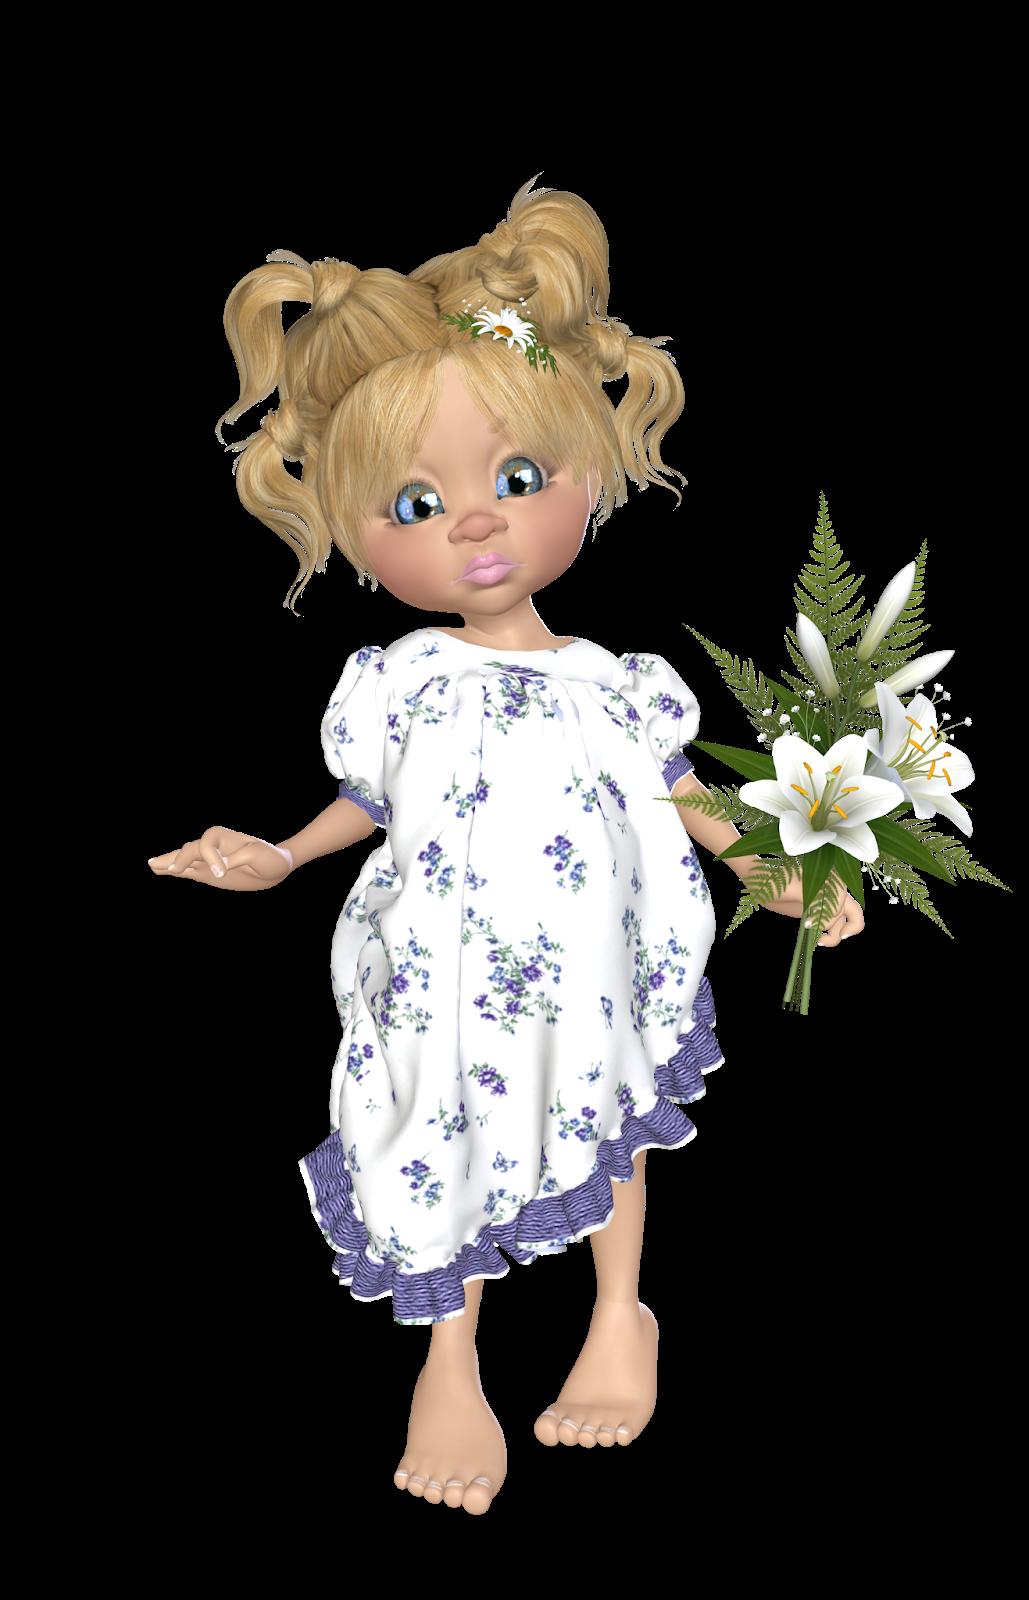 Pin By Basia Zuzia On Laleczki Maluszki Cute Cartoon Disney Characters Cartoon